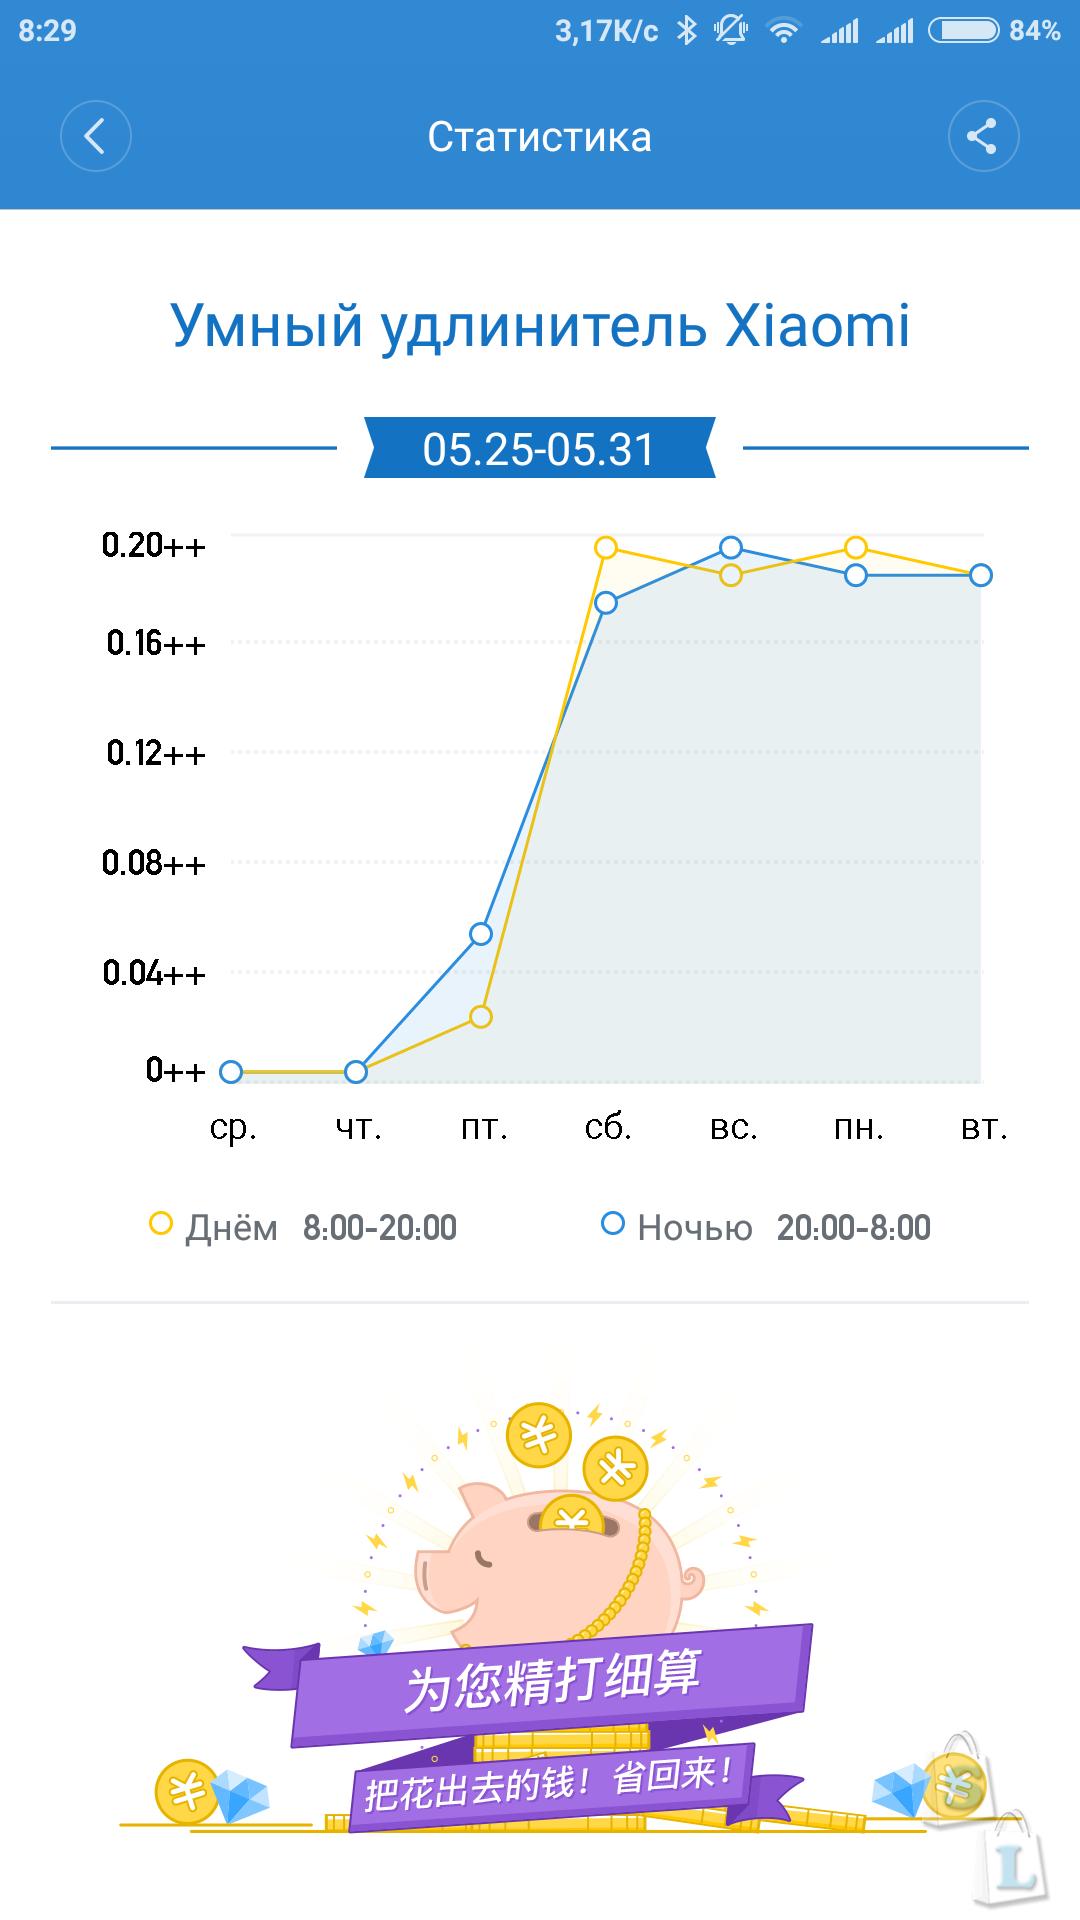 Banggood: Обзор, настройка и работа с Wi-Fi смарт удлинителем Xiaomi SMART Power Strip